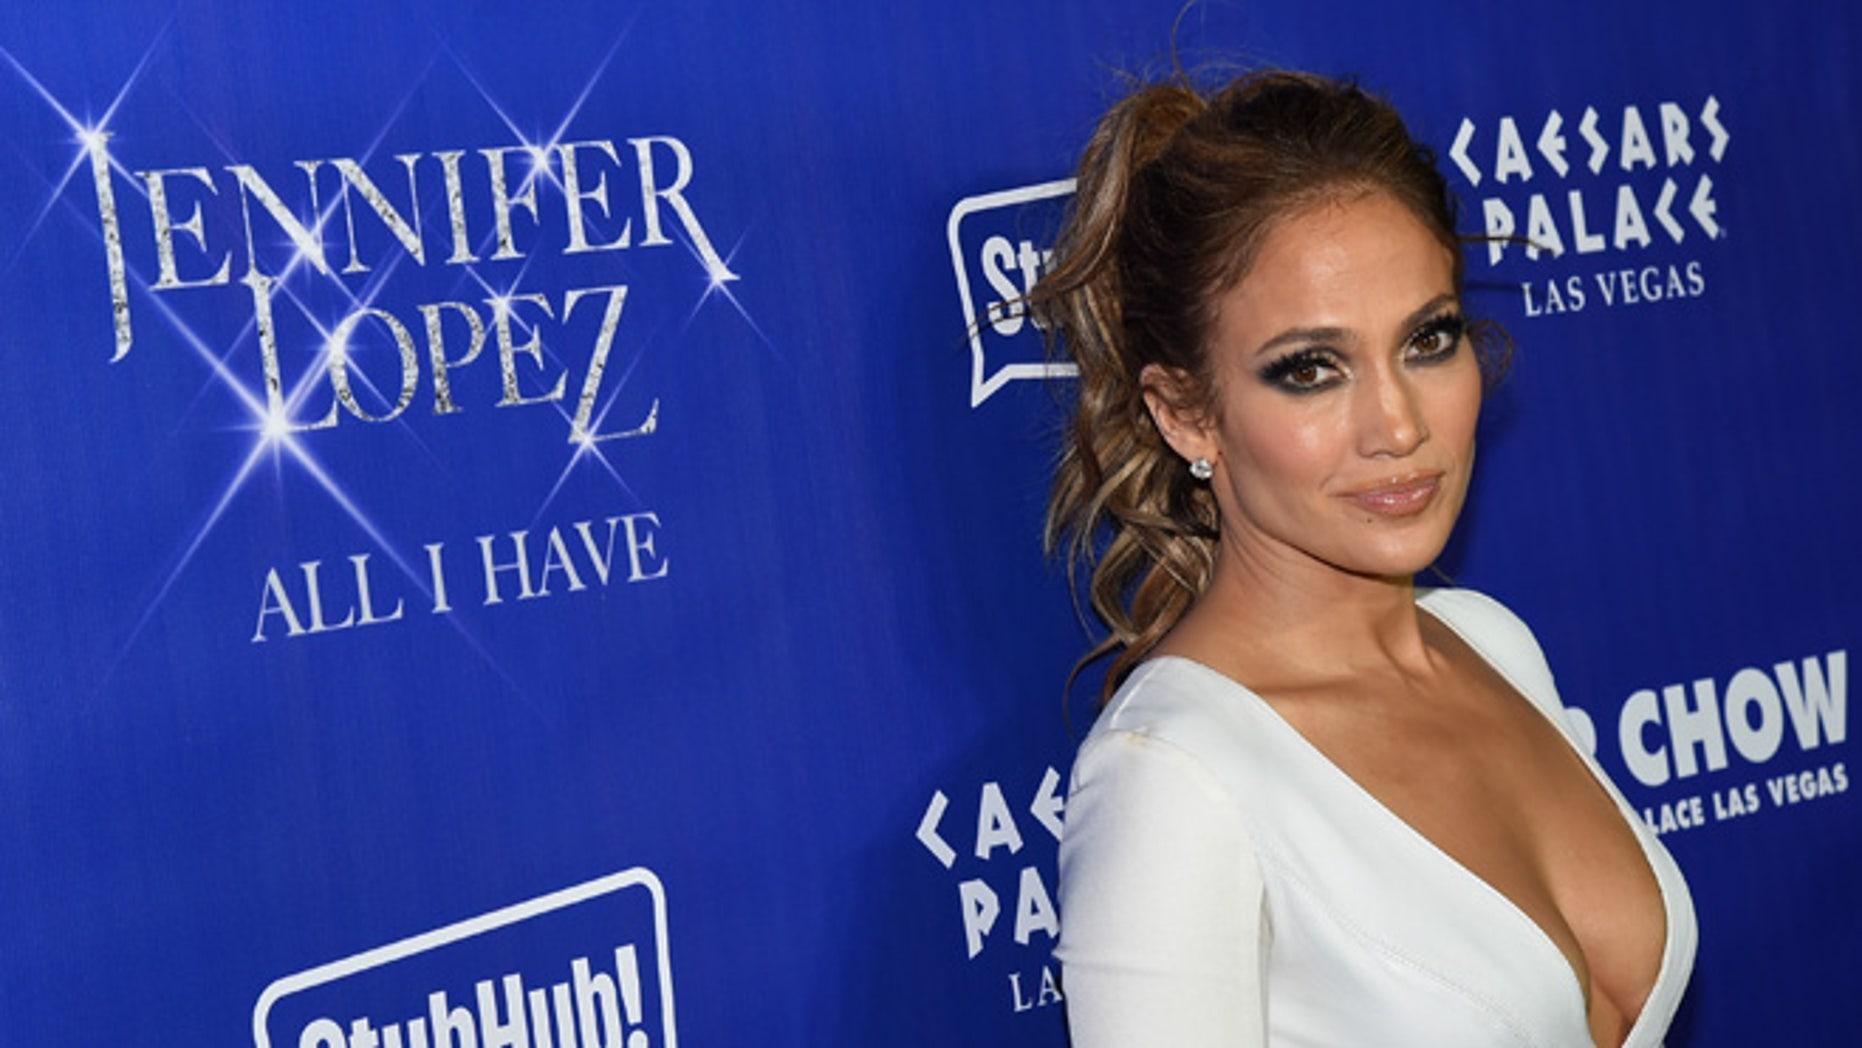 Jennifer Lopez at Caesars Palace on January 21, 2016 in Las Vegas, Nevada.